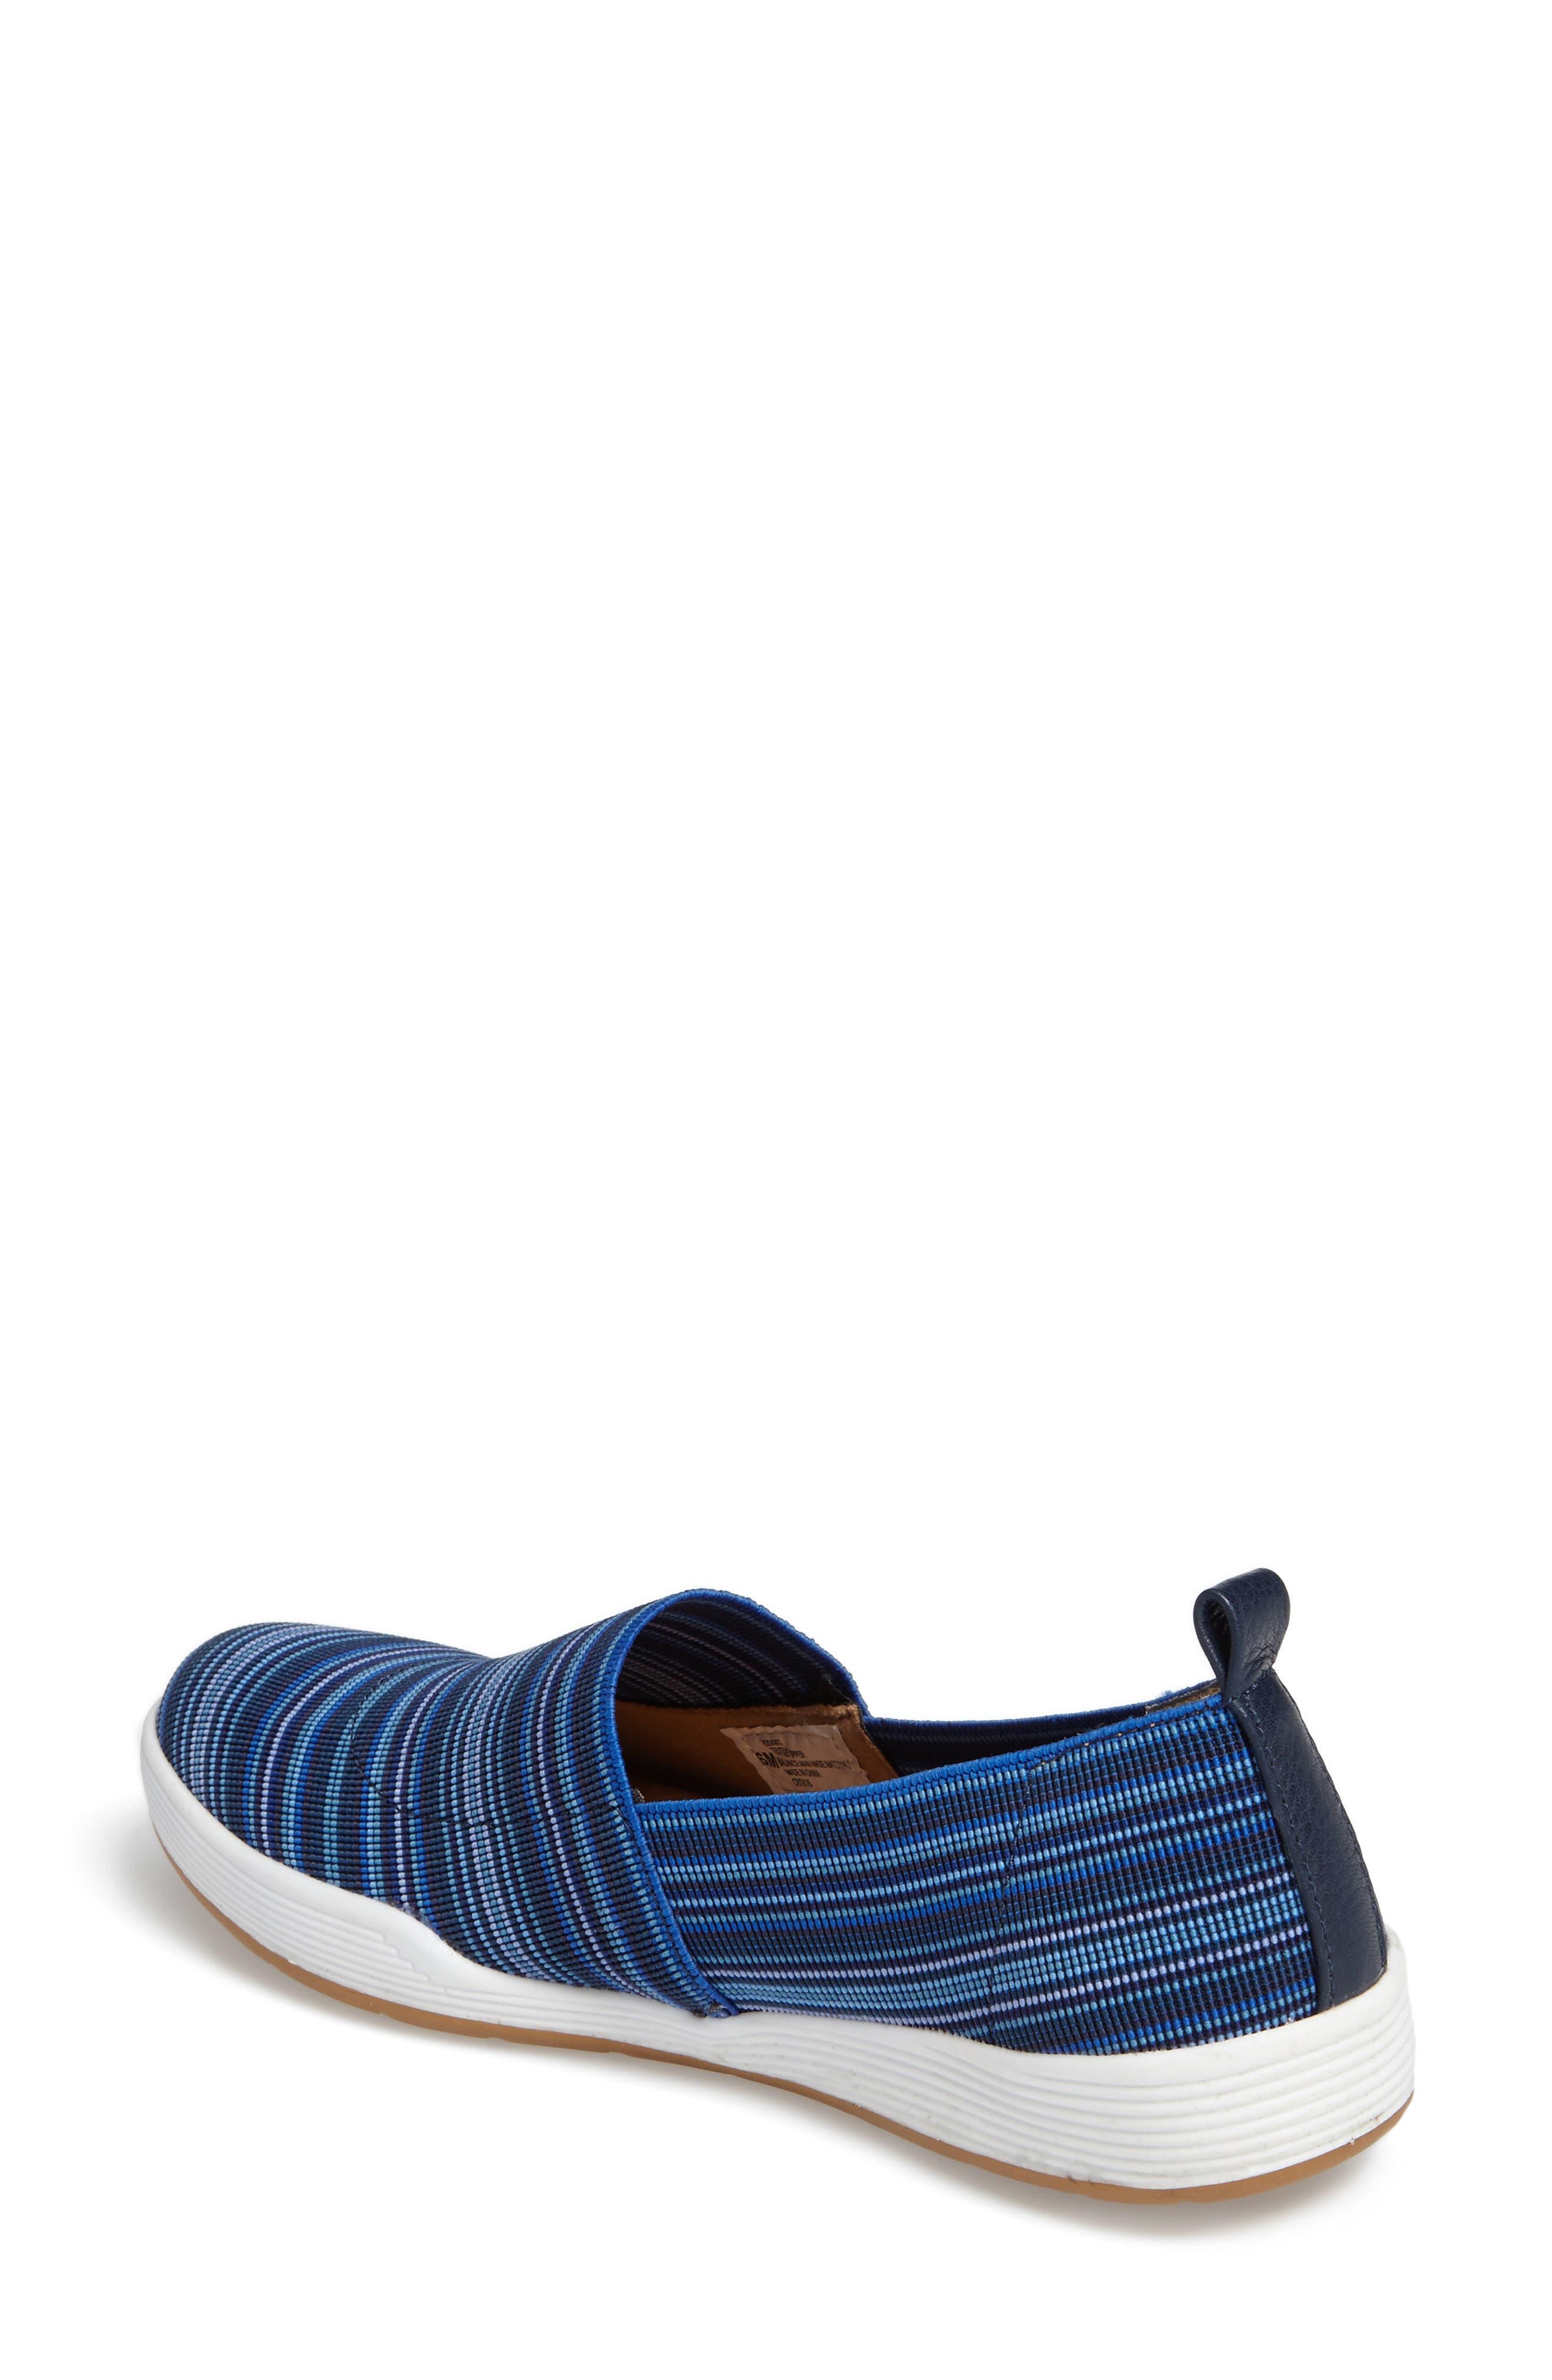 Lida Slip-On Flat,                             Alternate thumbnail 2, color,                             Blue Fabric